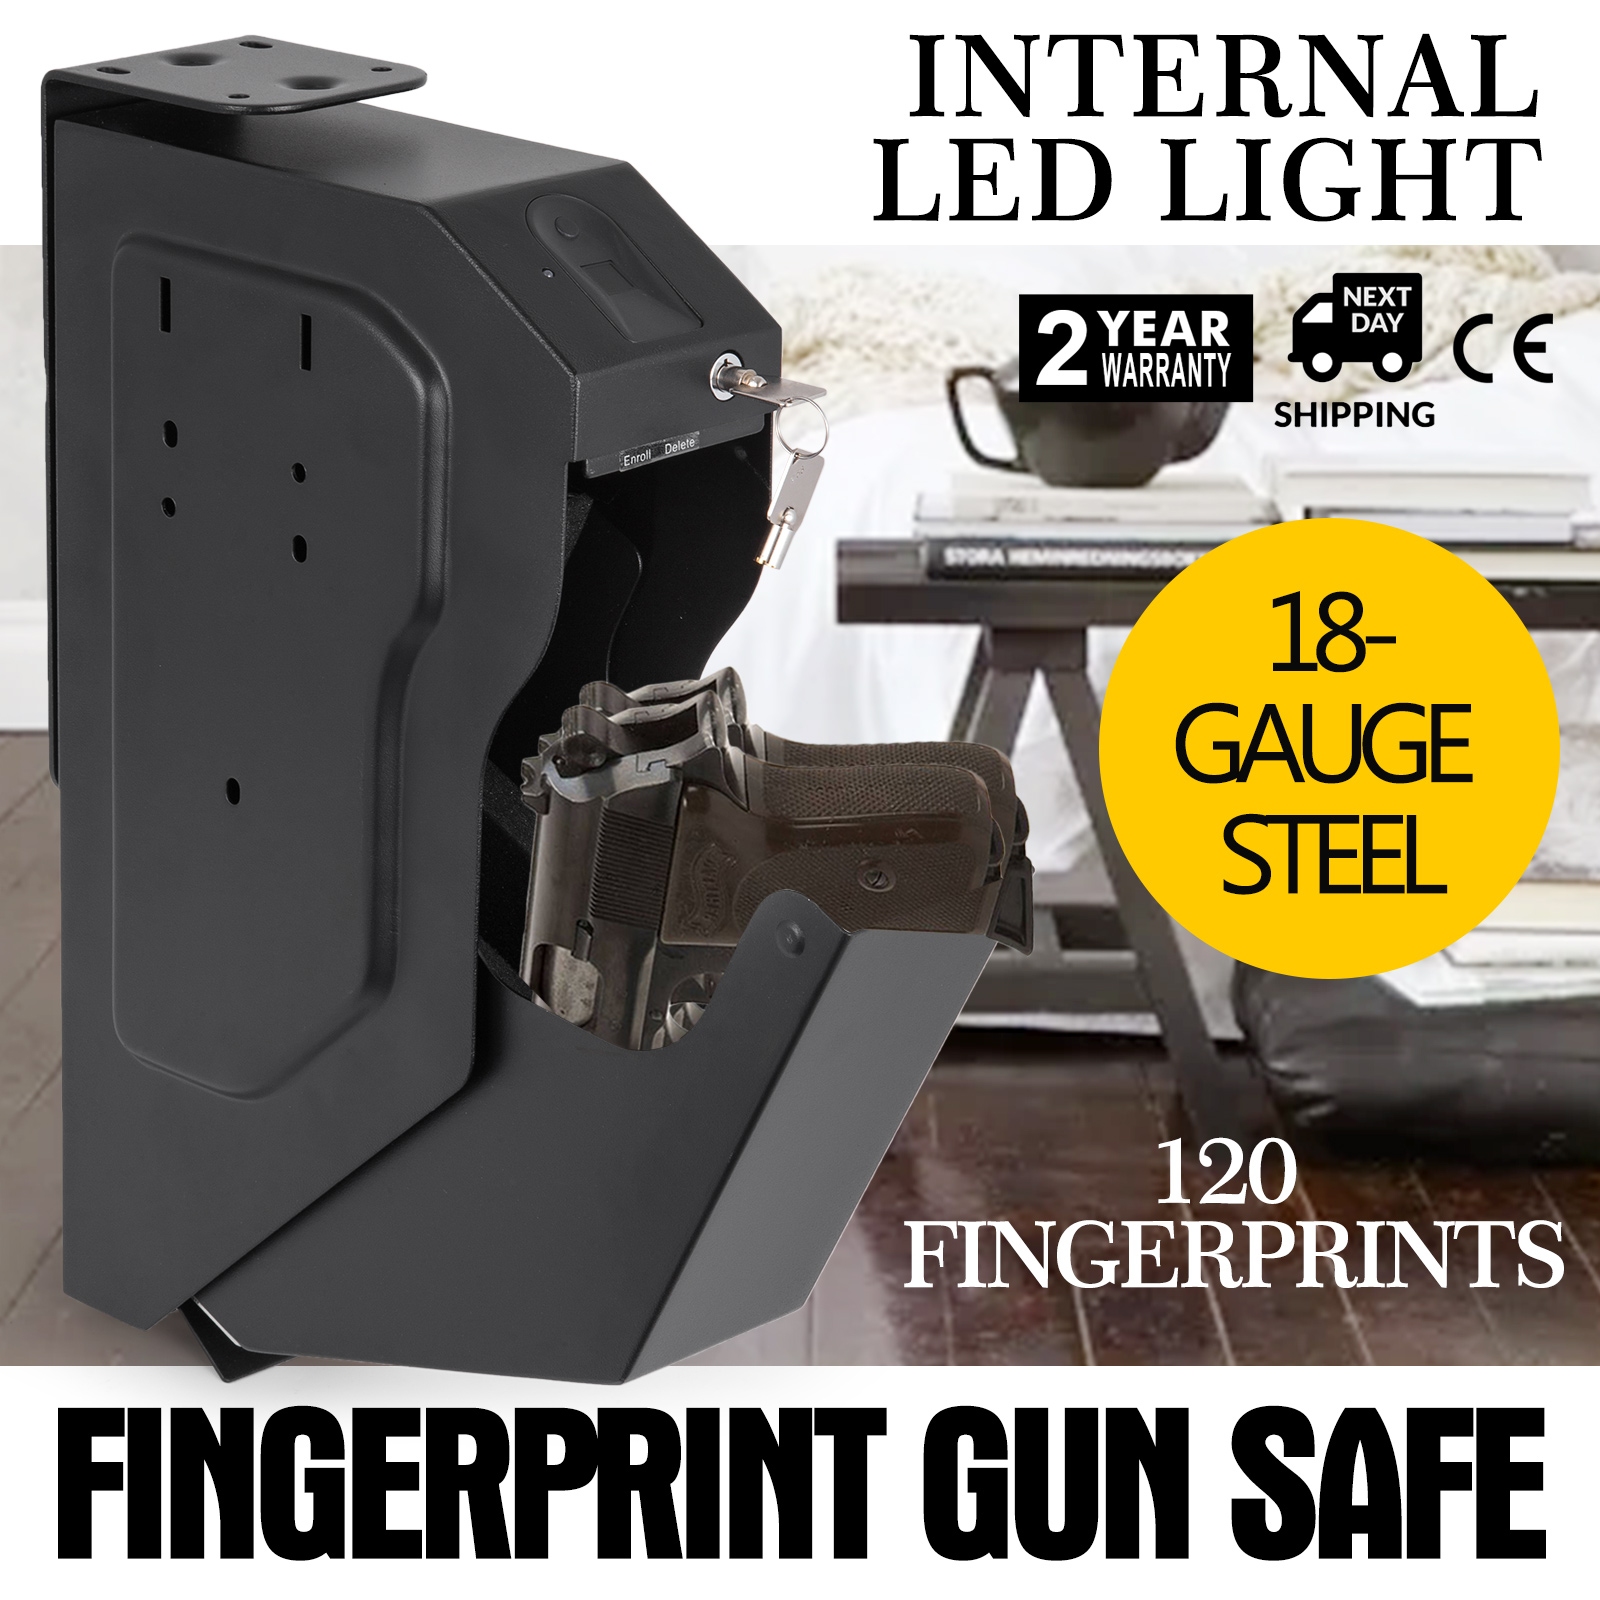 Pistol-Safe-Hand-Gun-Safe-Box-Biometric-Fingerprint-Storage-Home-Office-Security